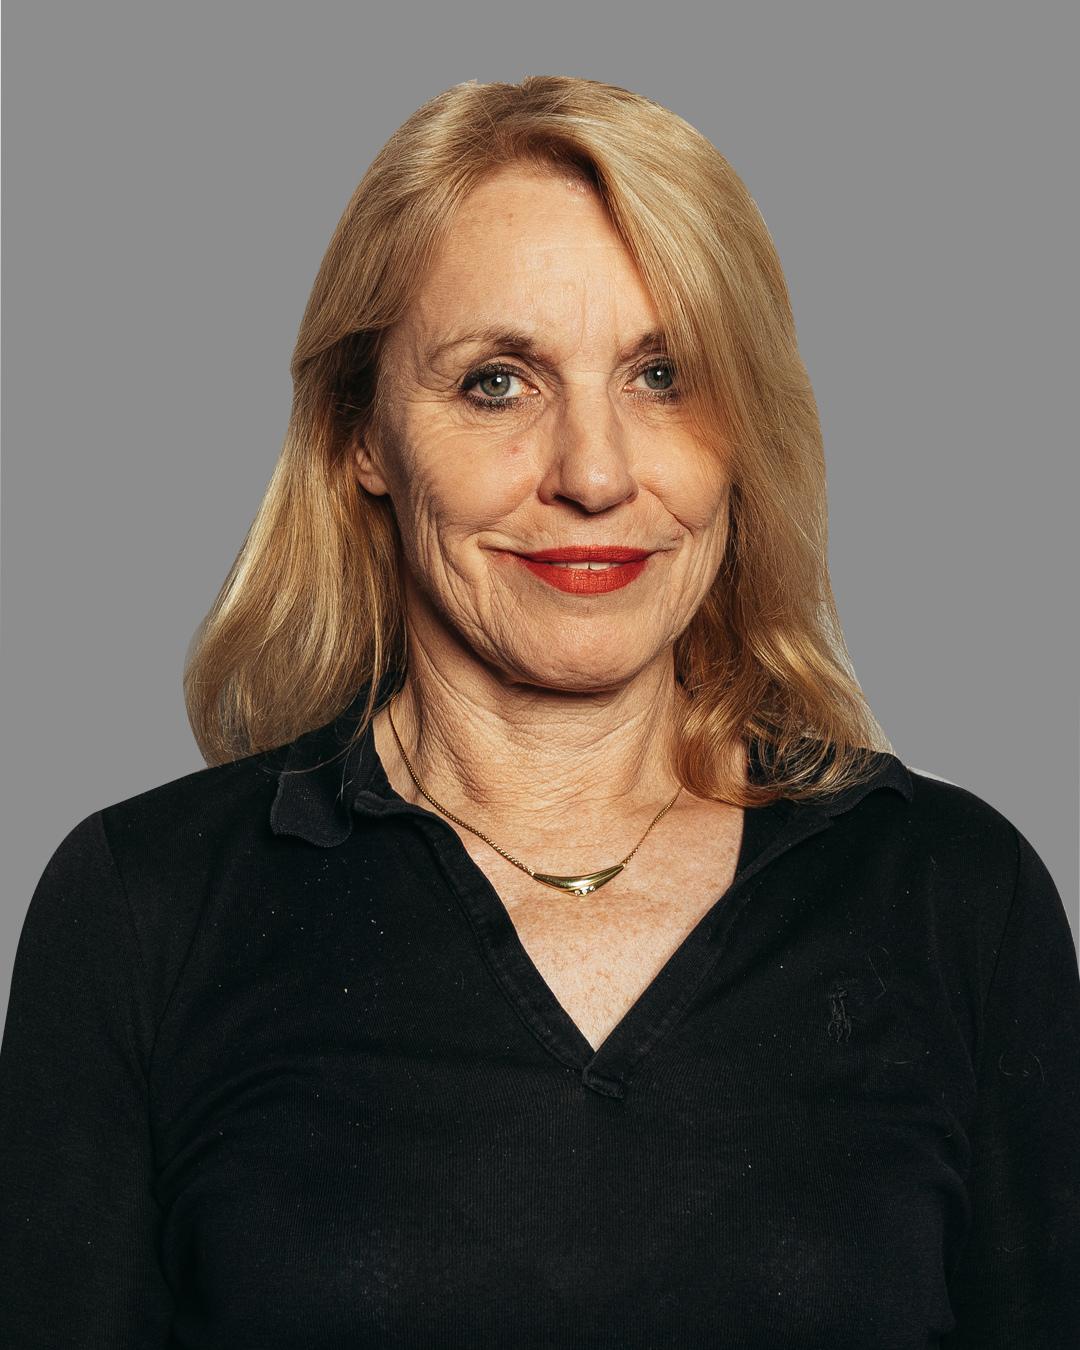 Bettina Evert